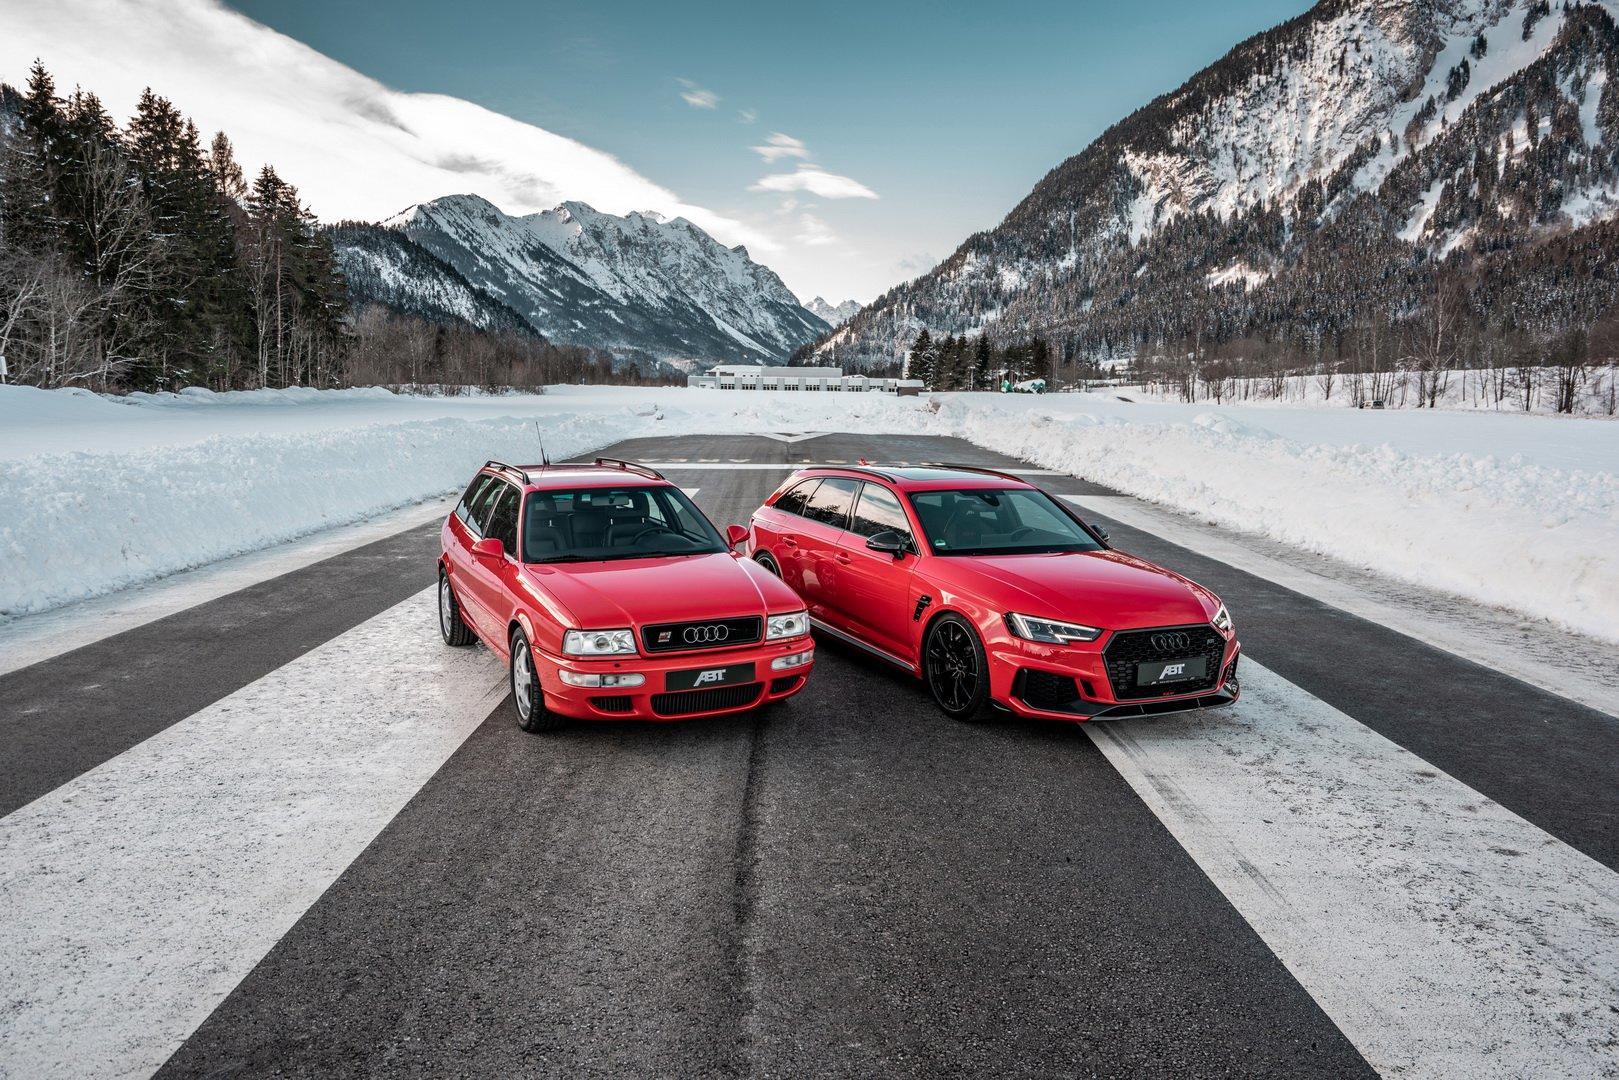 Sedinta foto ABT cu Audi RS2 si Audi RS4 Avant - Sedinta foto ABT cu Audi RS2 si Audi RS4 Avant